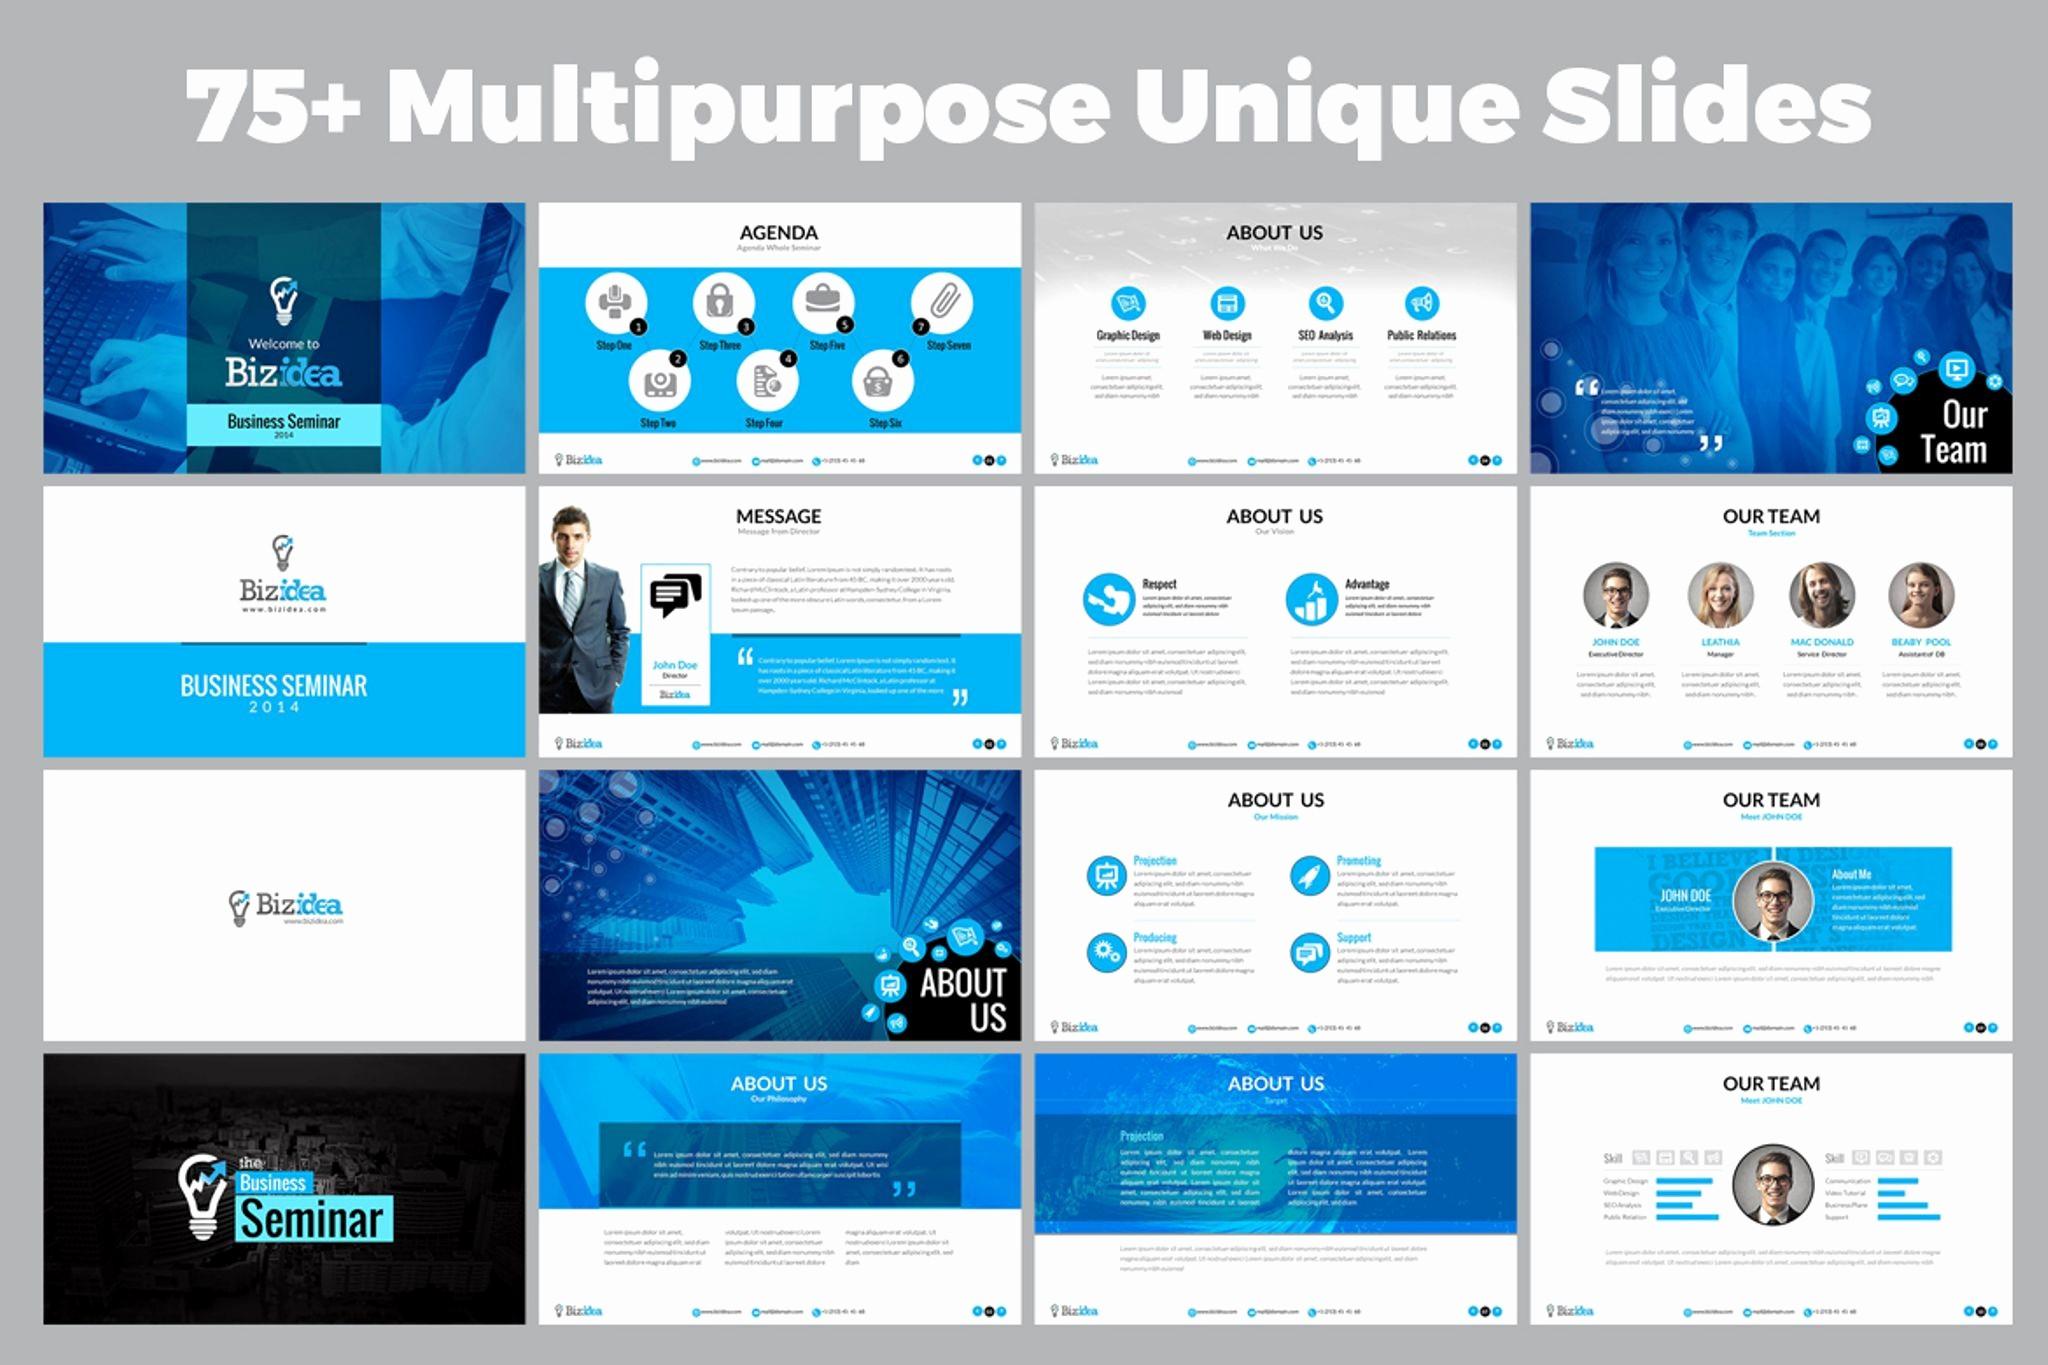 Ppt Templates for Business Presentation Awesome Plantilla Powerpoint Para Sitio De Estudios De Diseño